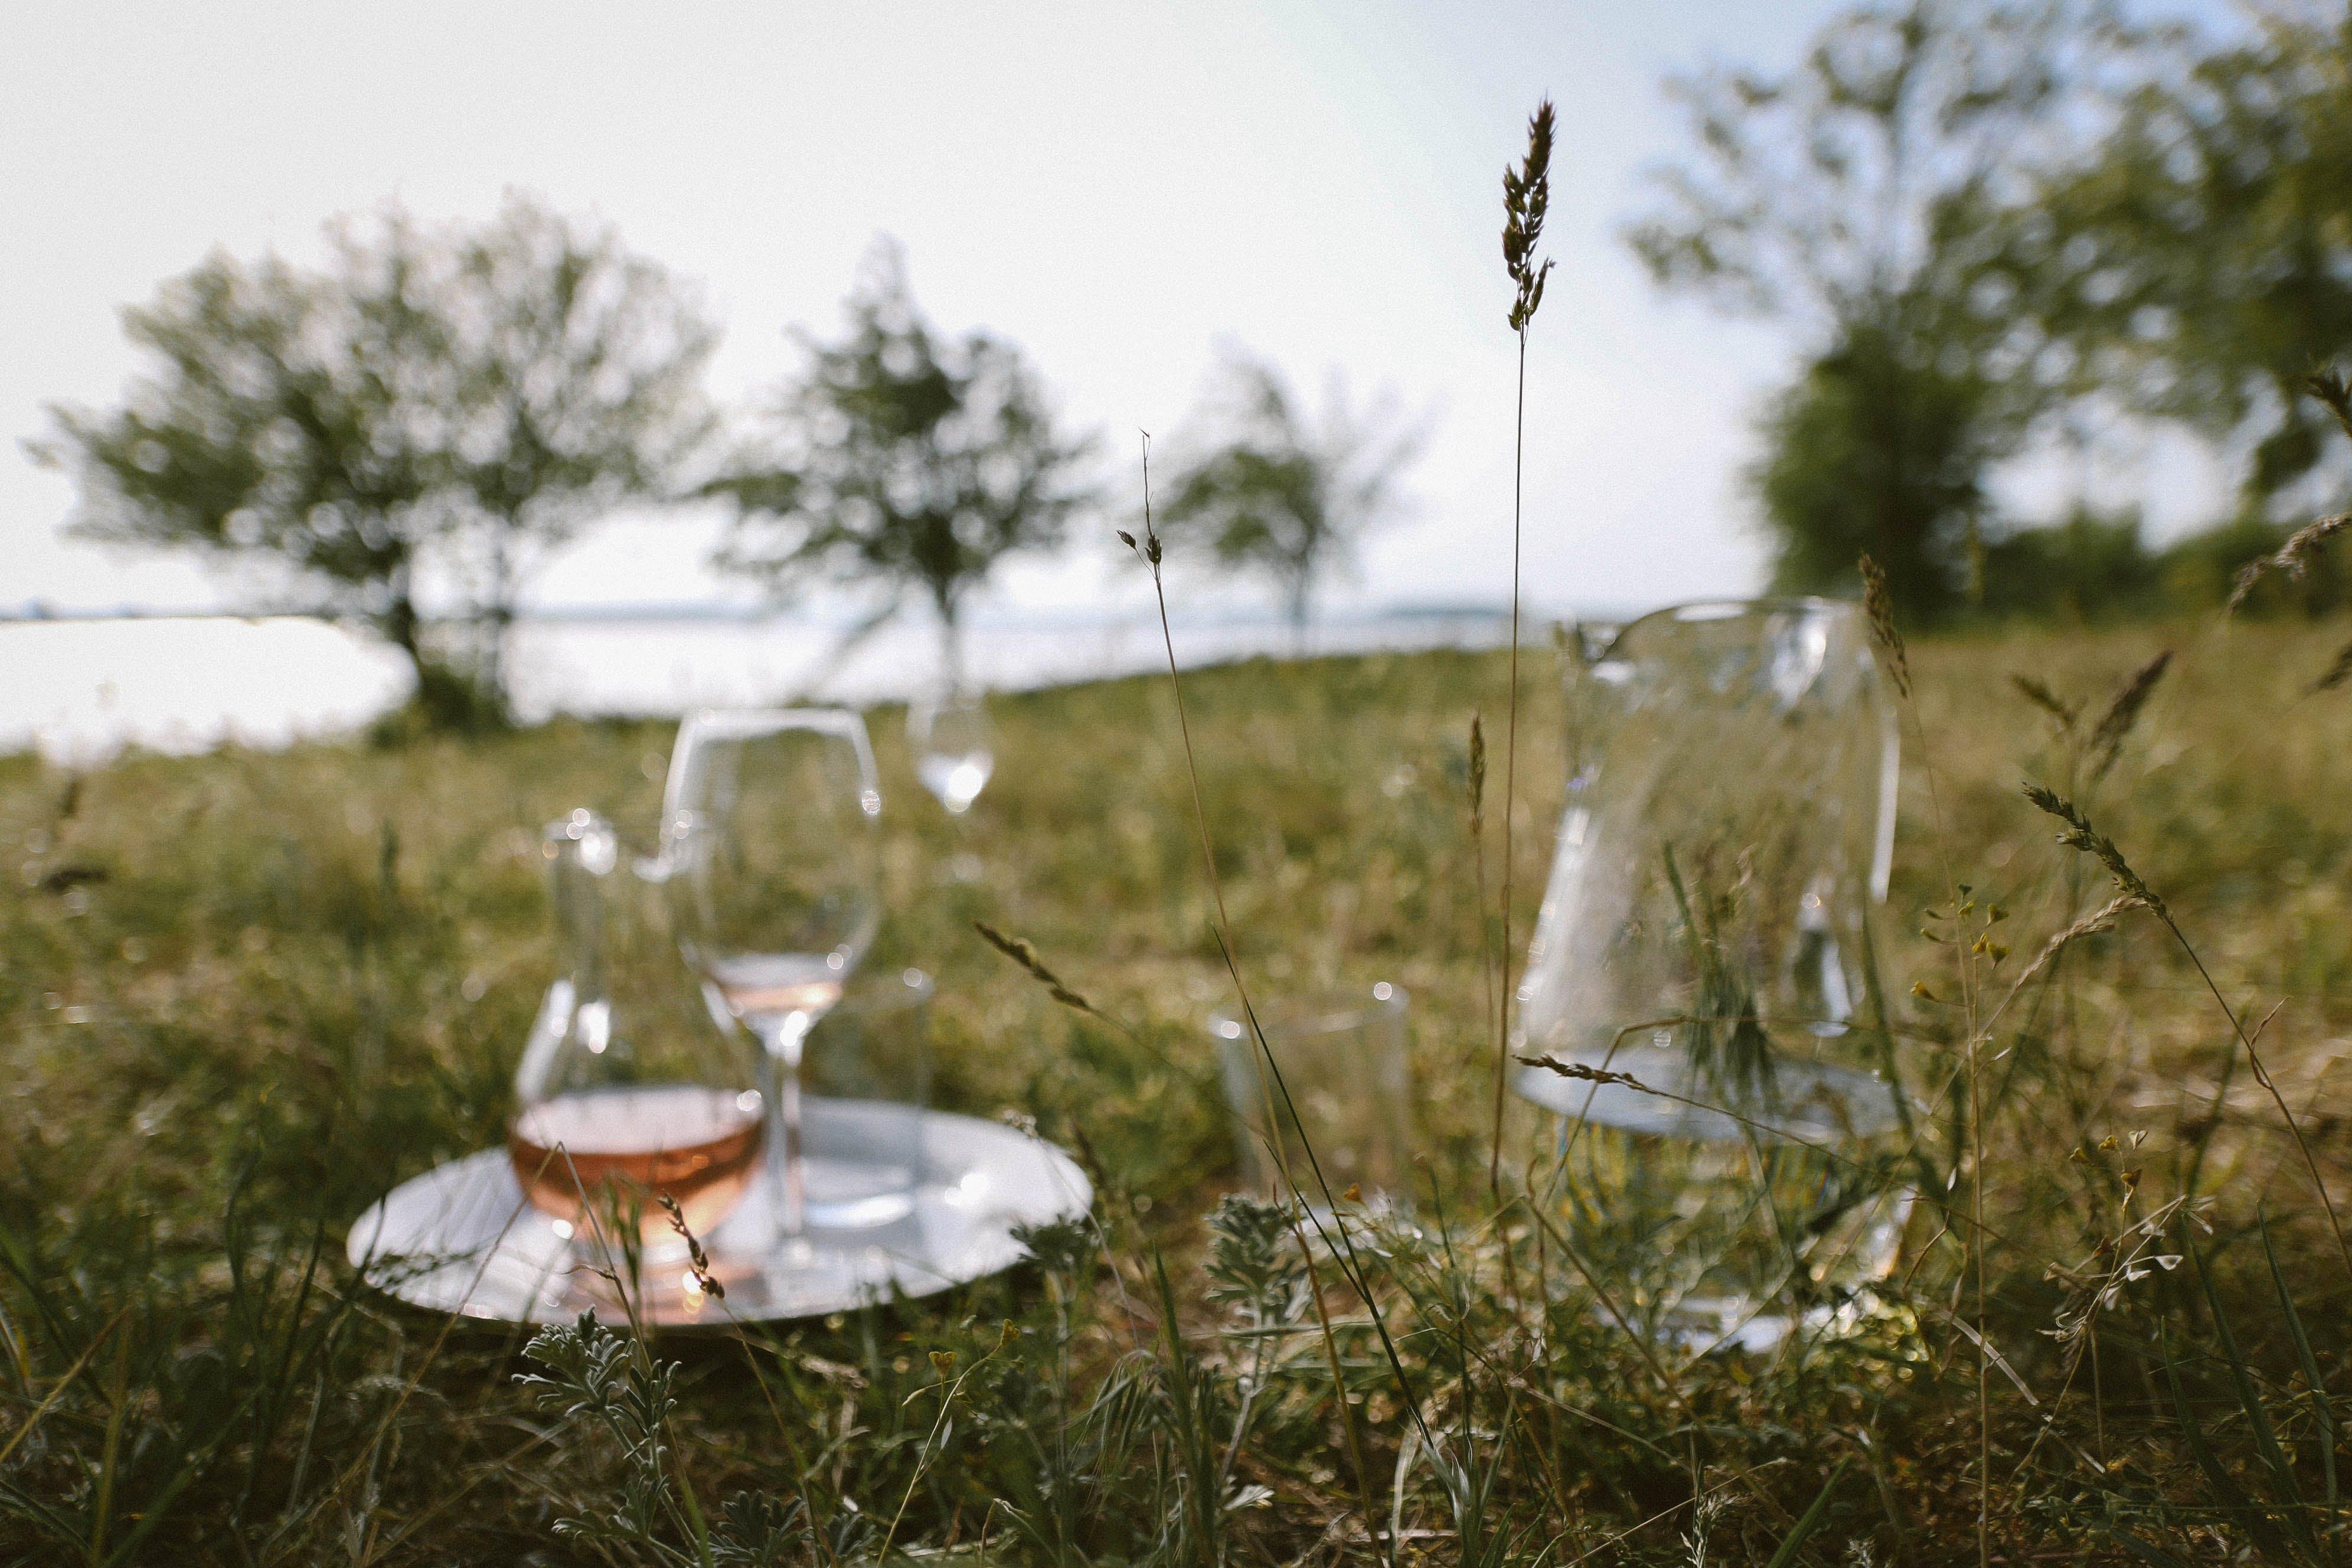 Free stock photo of carafe, decanter, focus, grass